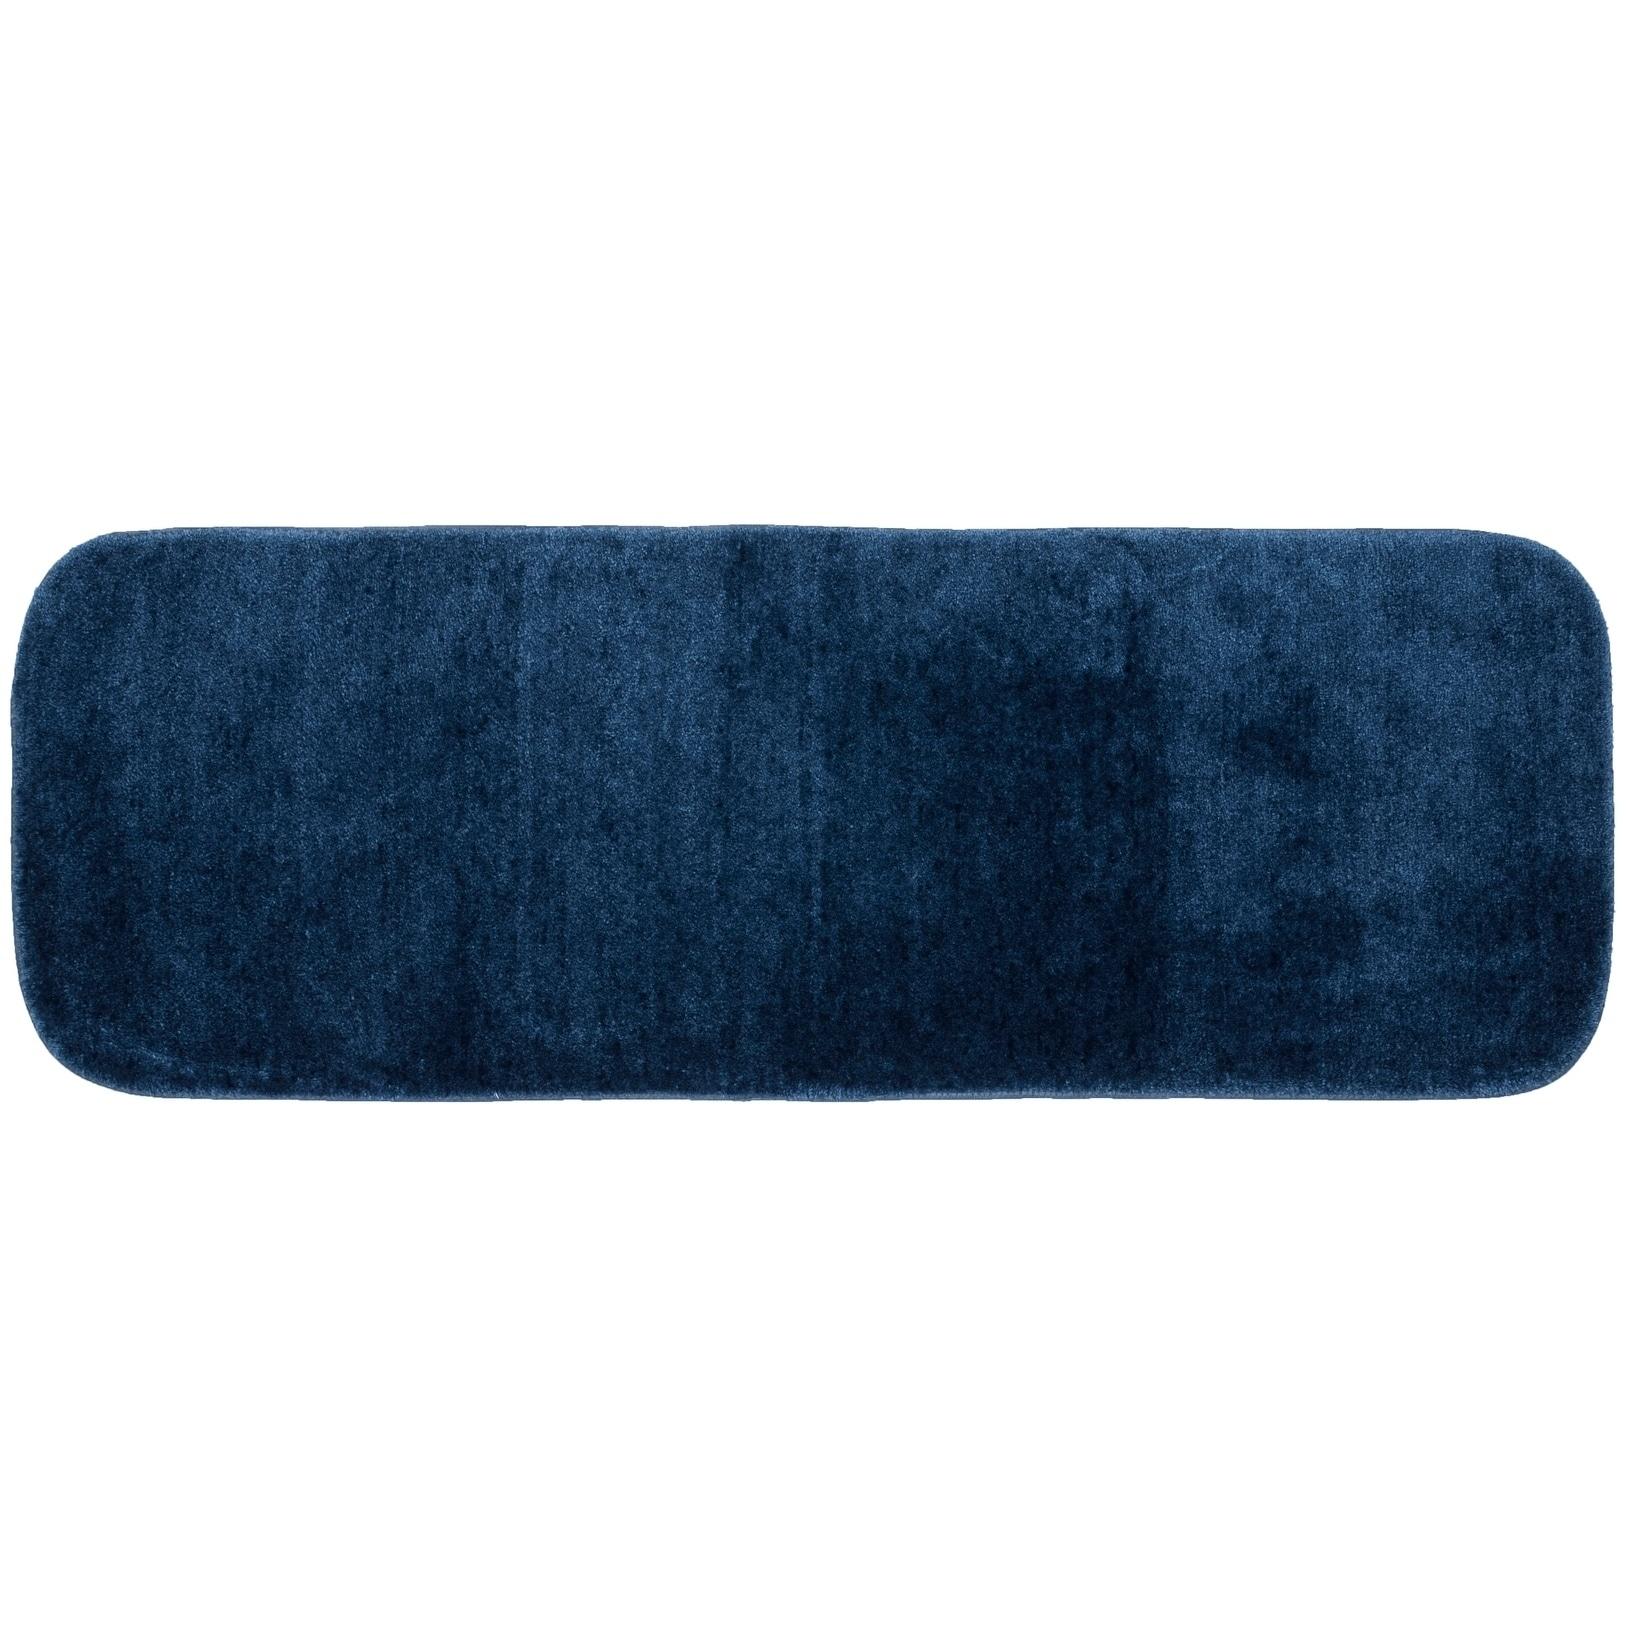 Traditional Plush Basin Blue Washable Nylon Bathroom Rug Runner